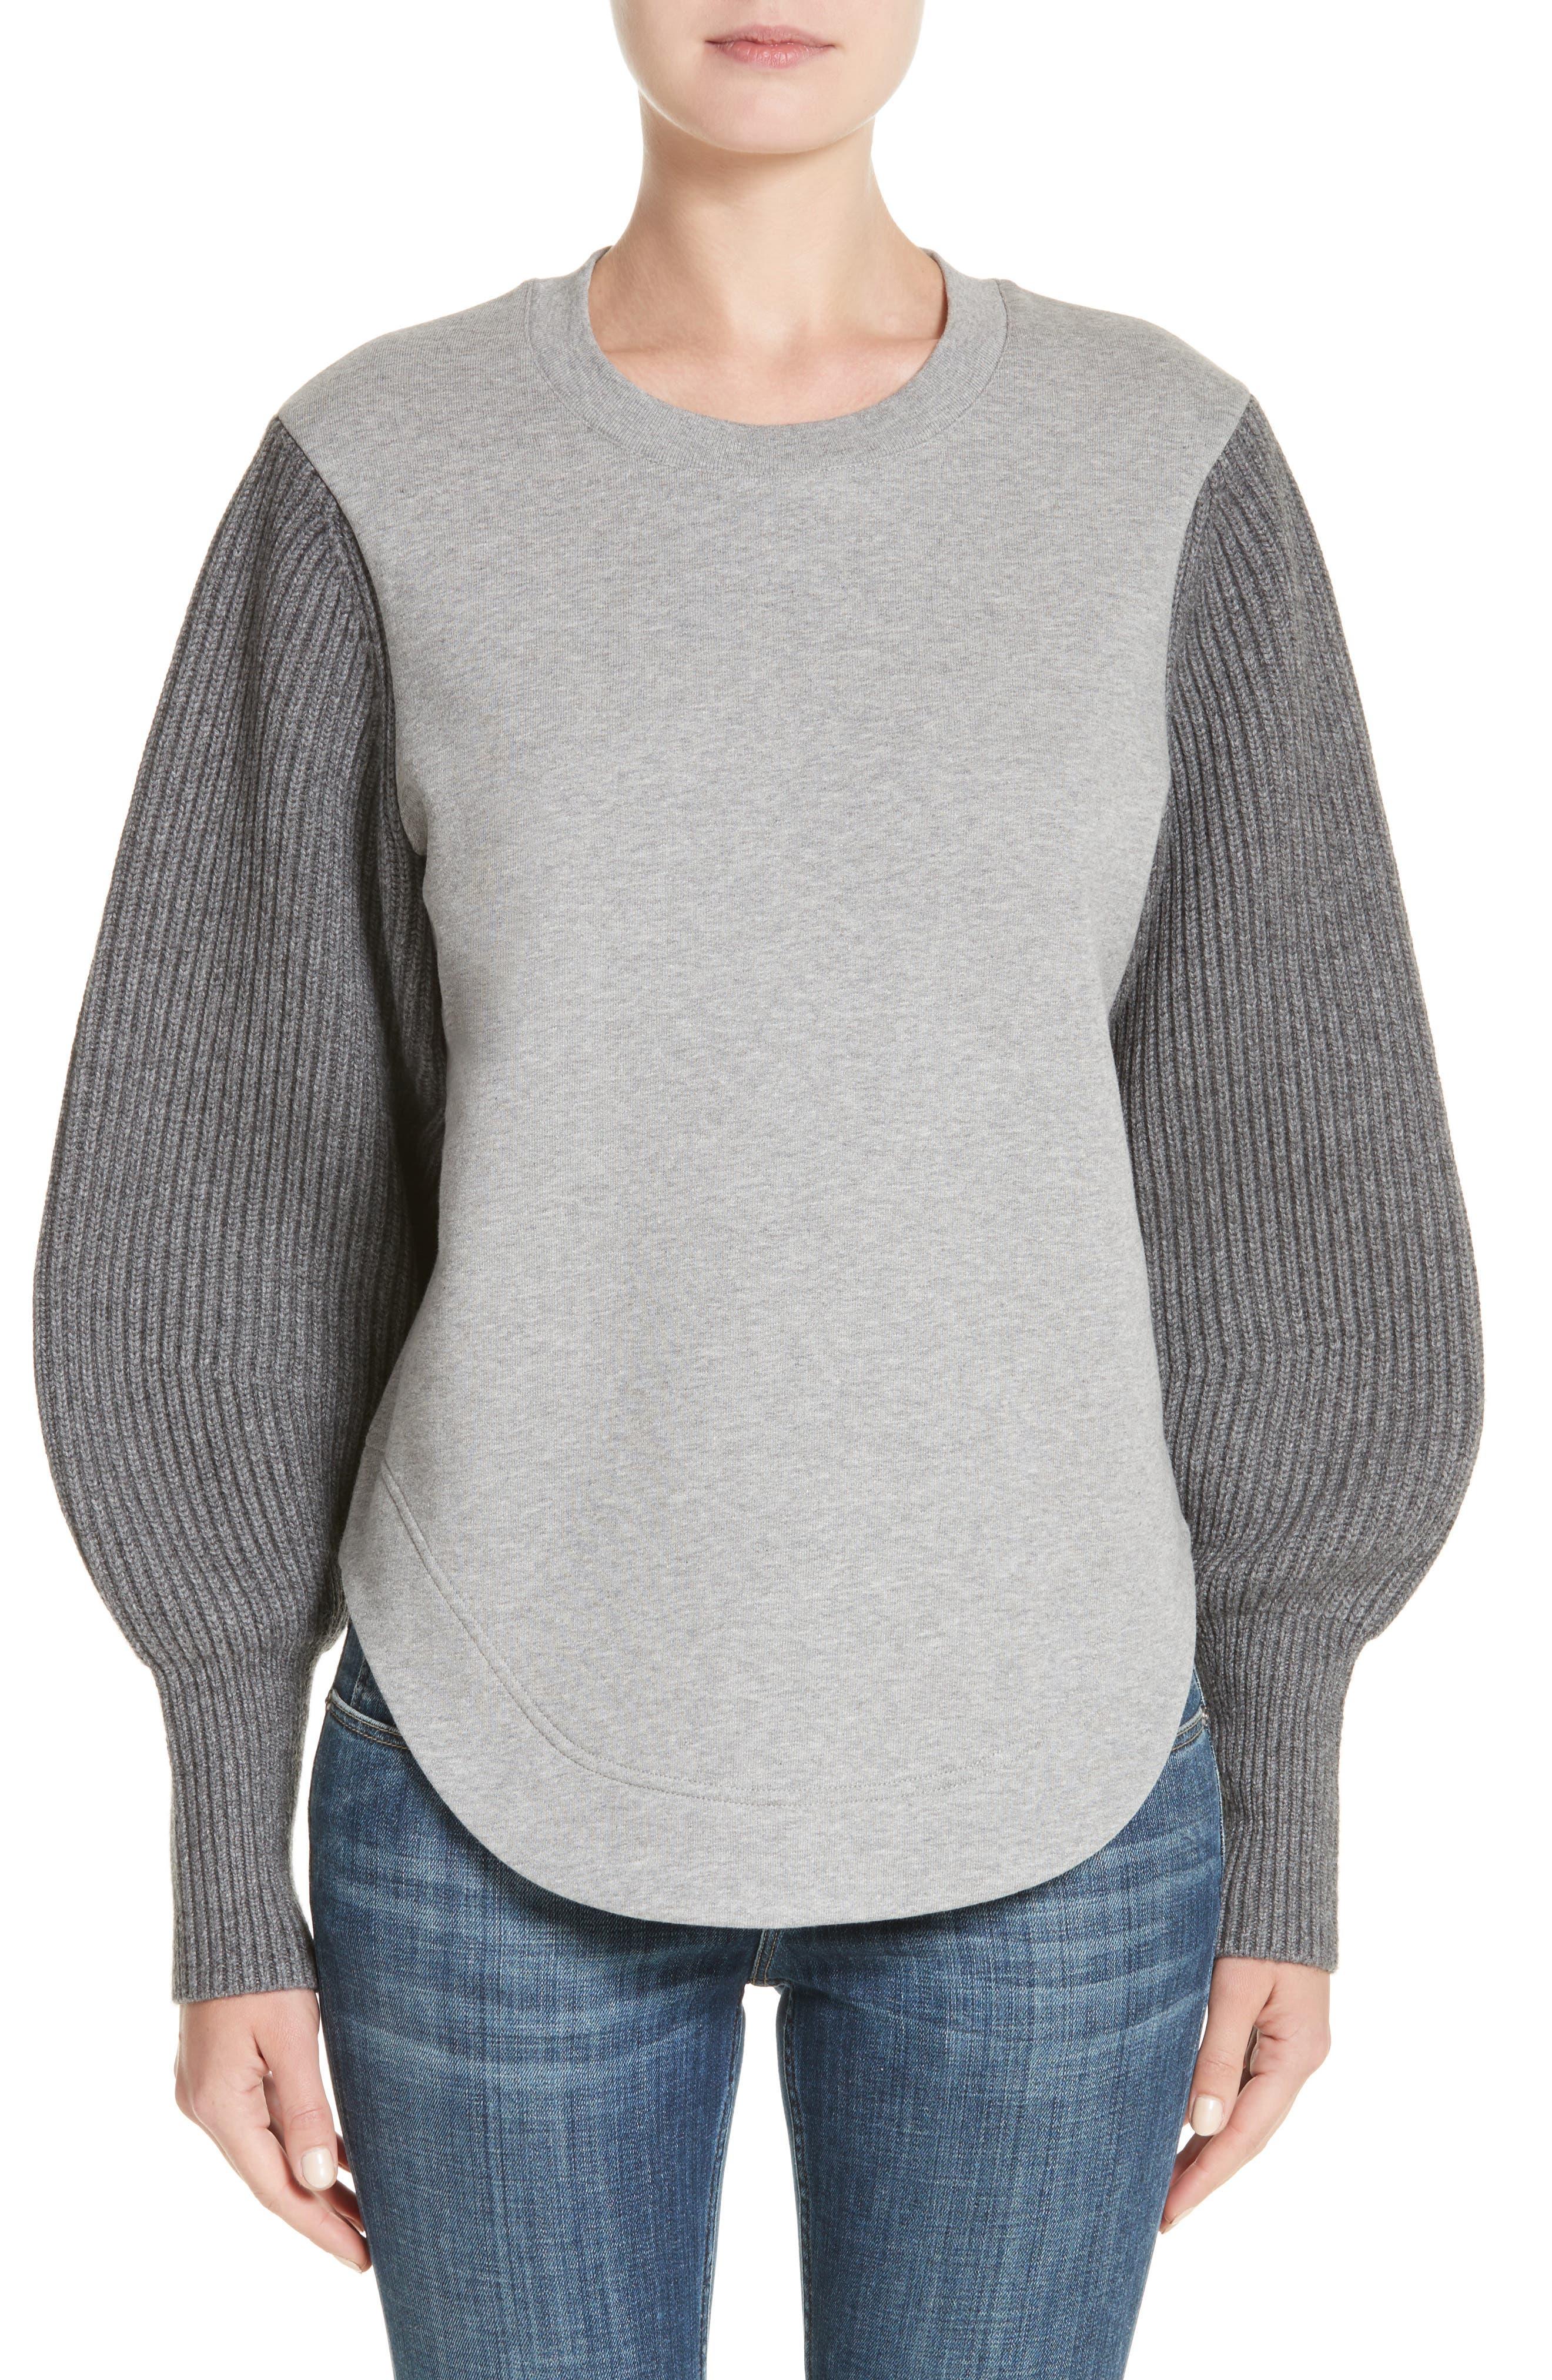 Alcobaca Rib Knit Sleeve Sweatshirt,                         Main,                         color, Pale Grey Melange